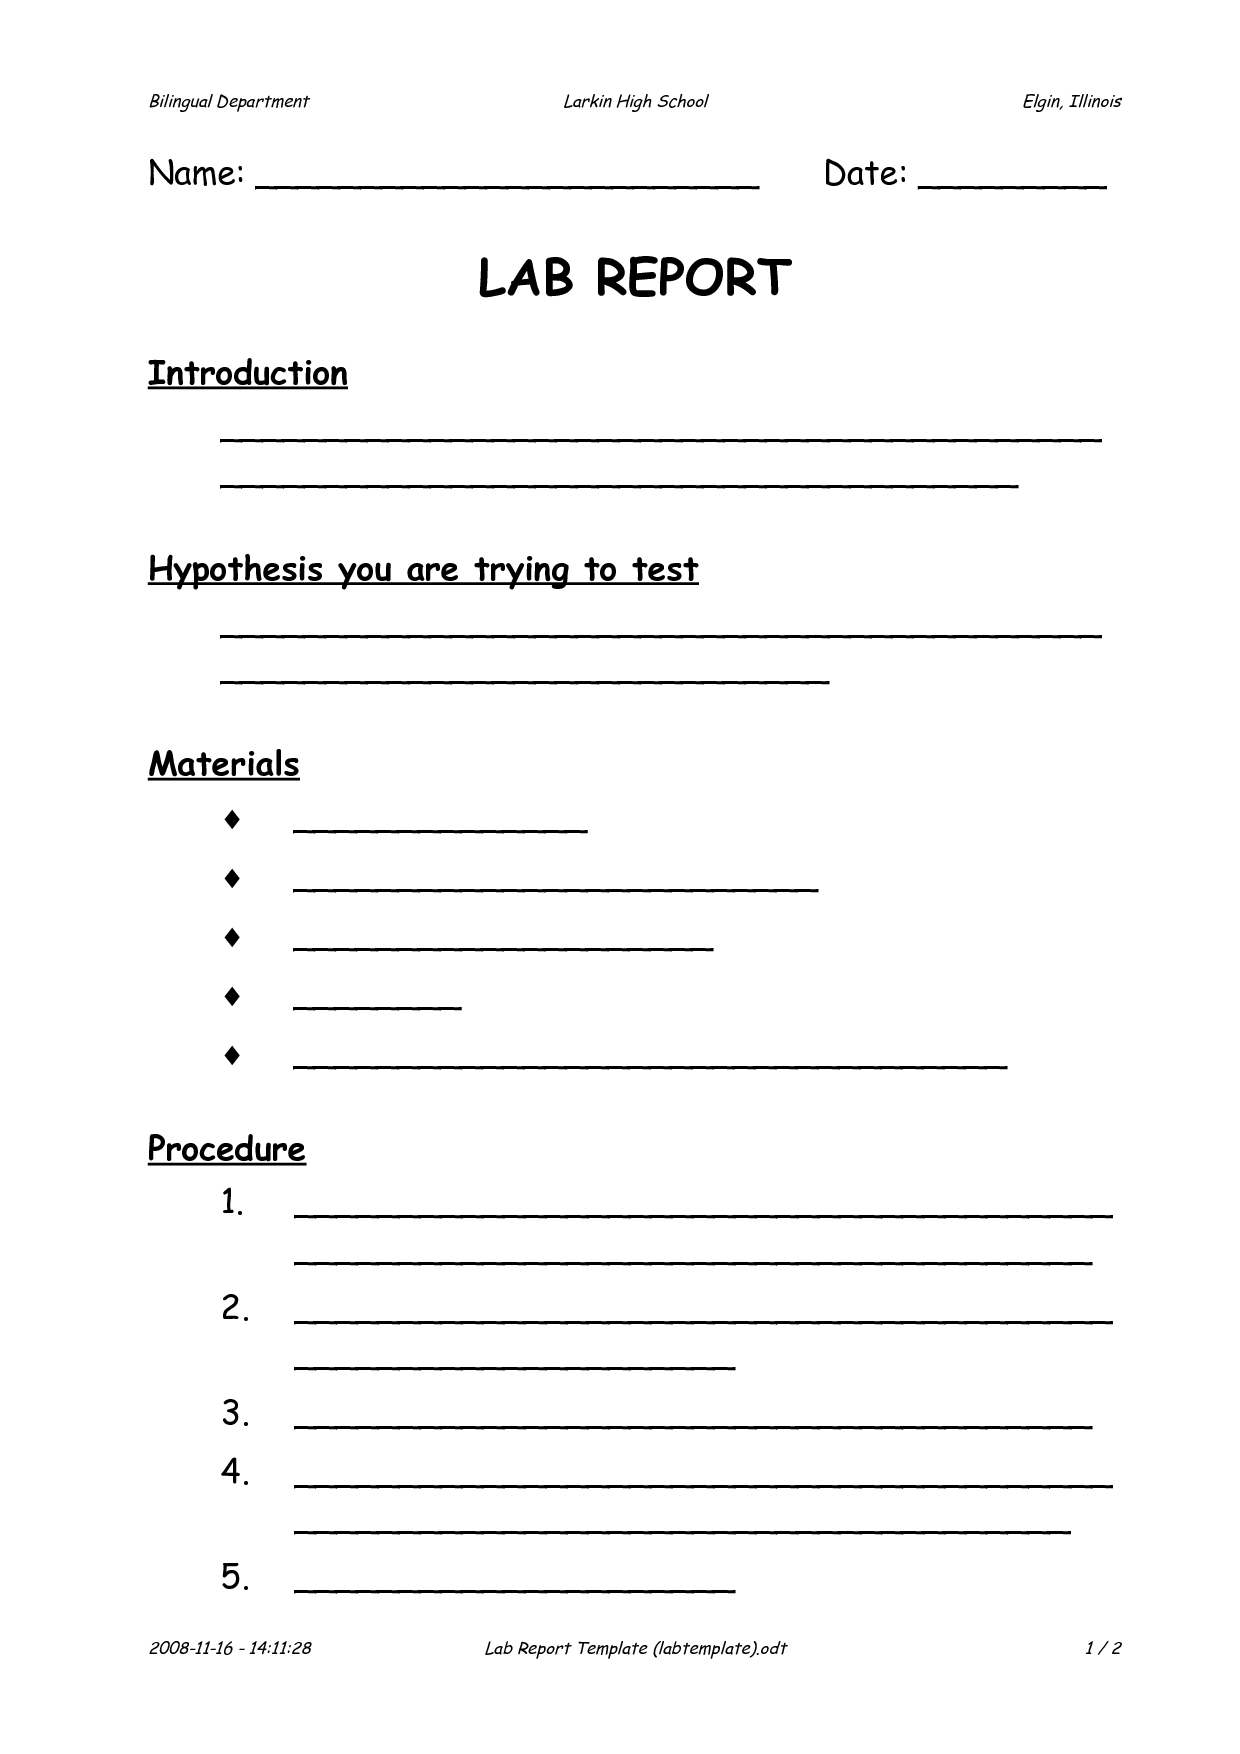 Lab Report Template Pdfnvh41087 7Glt4Bds | Lab Report regarding Lab Report Template Middle School